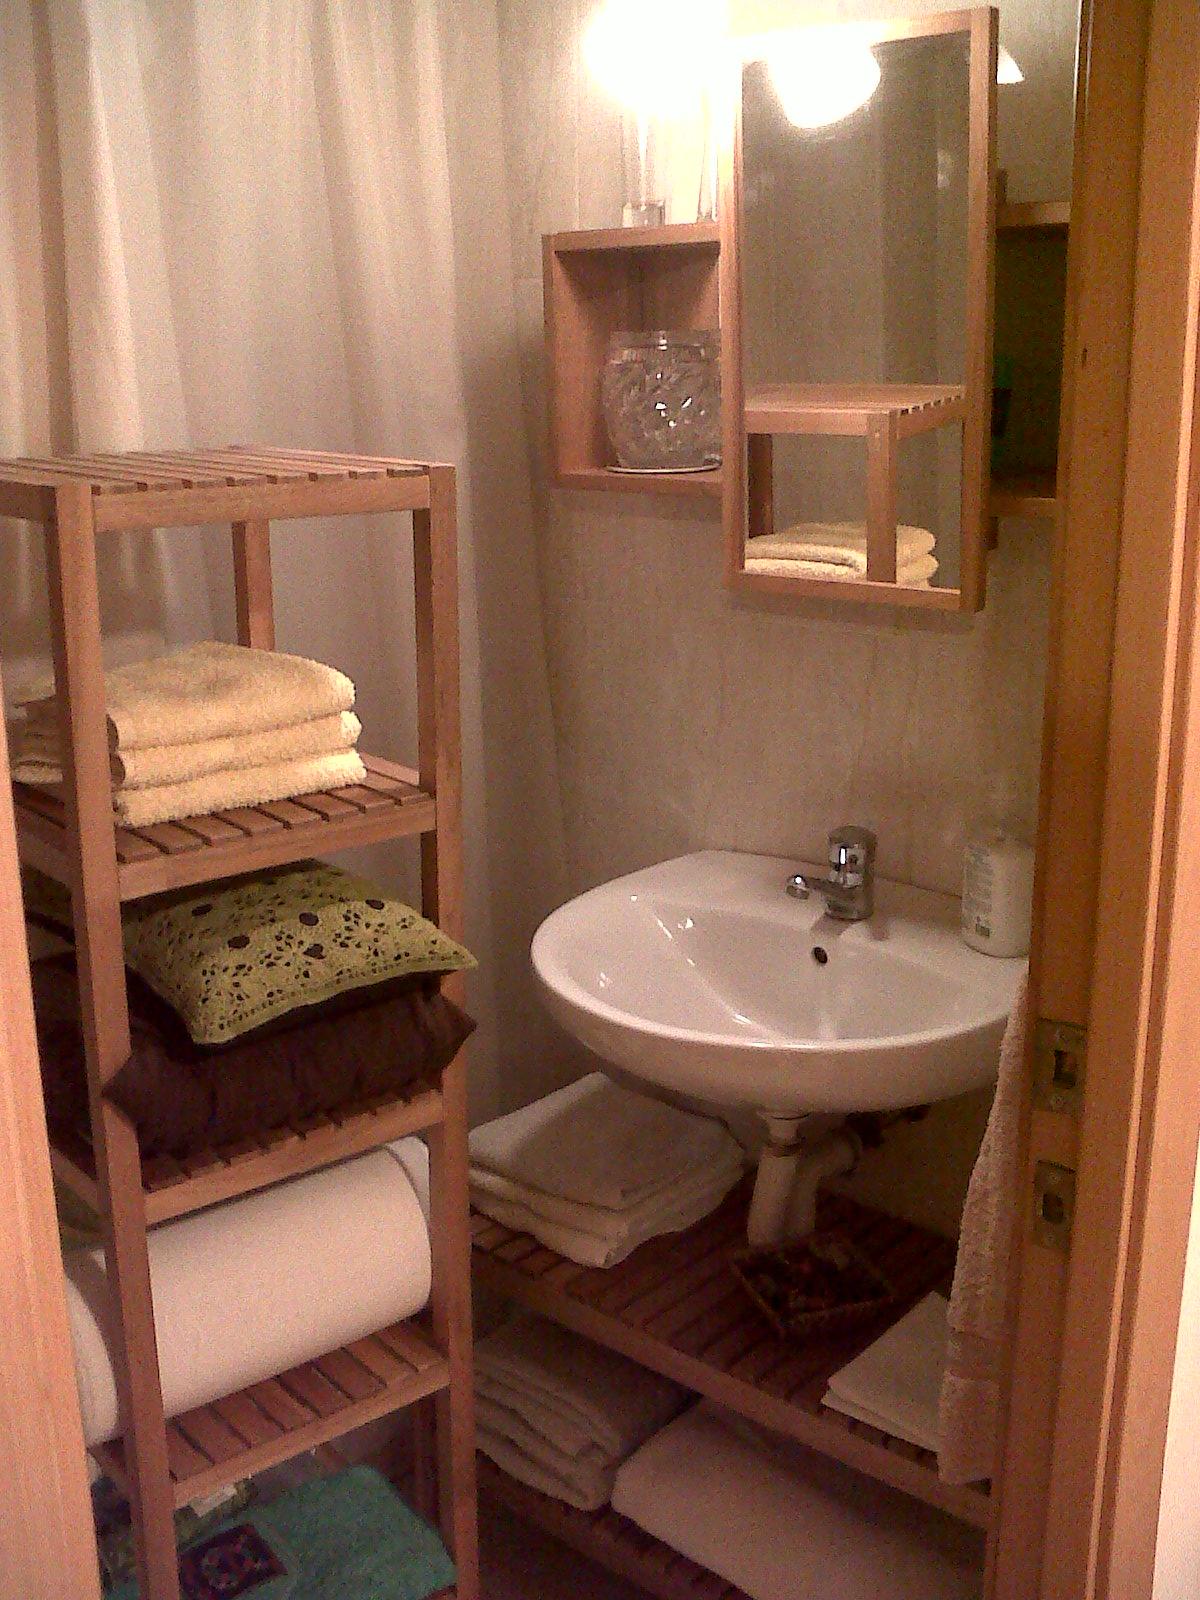 Imagenes de muebles de madera para ba o for Muebles de bano